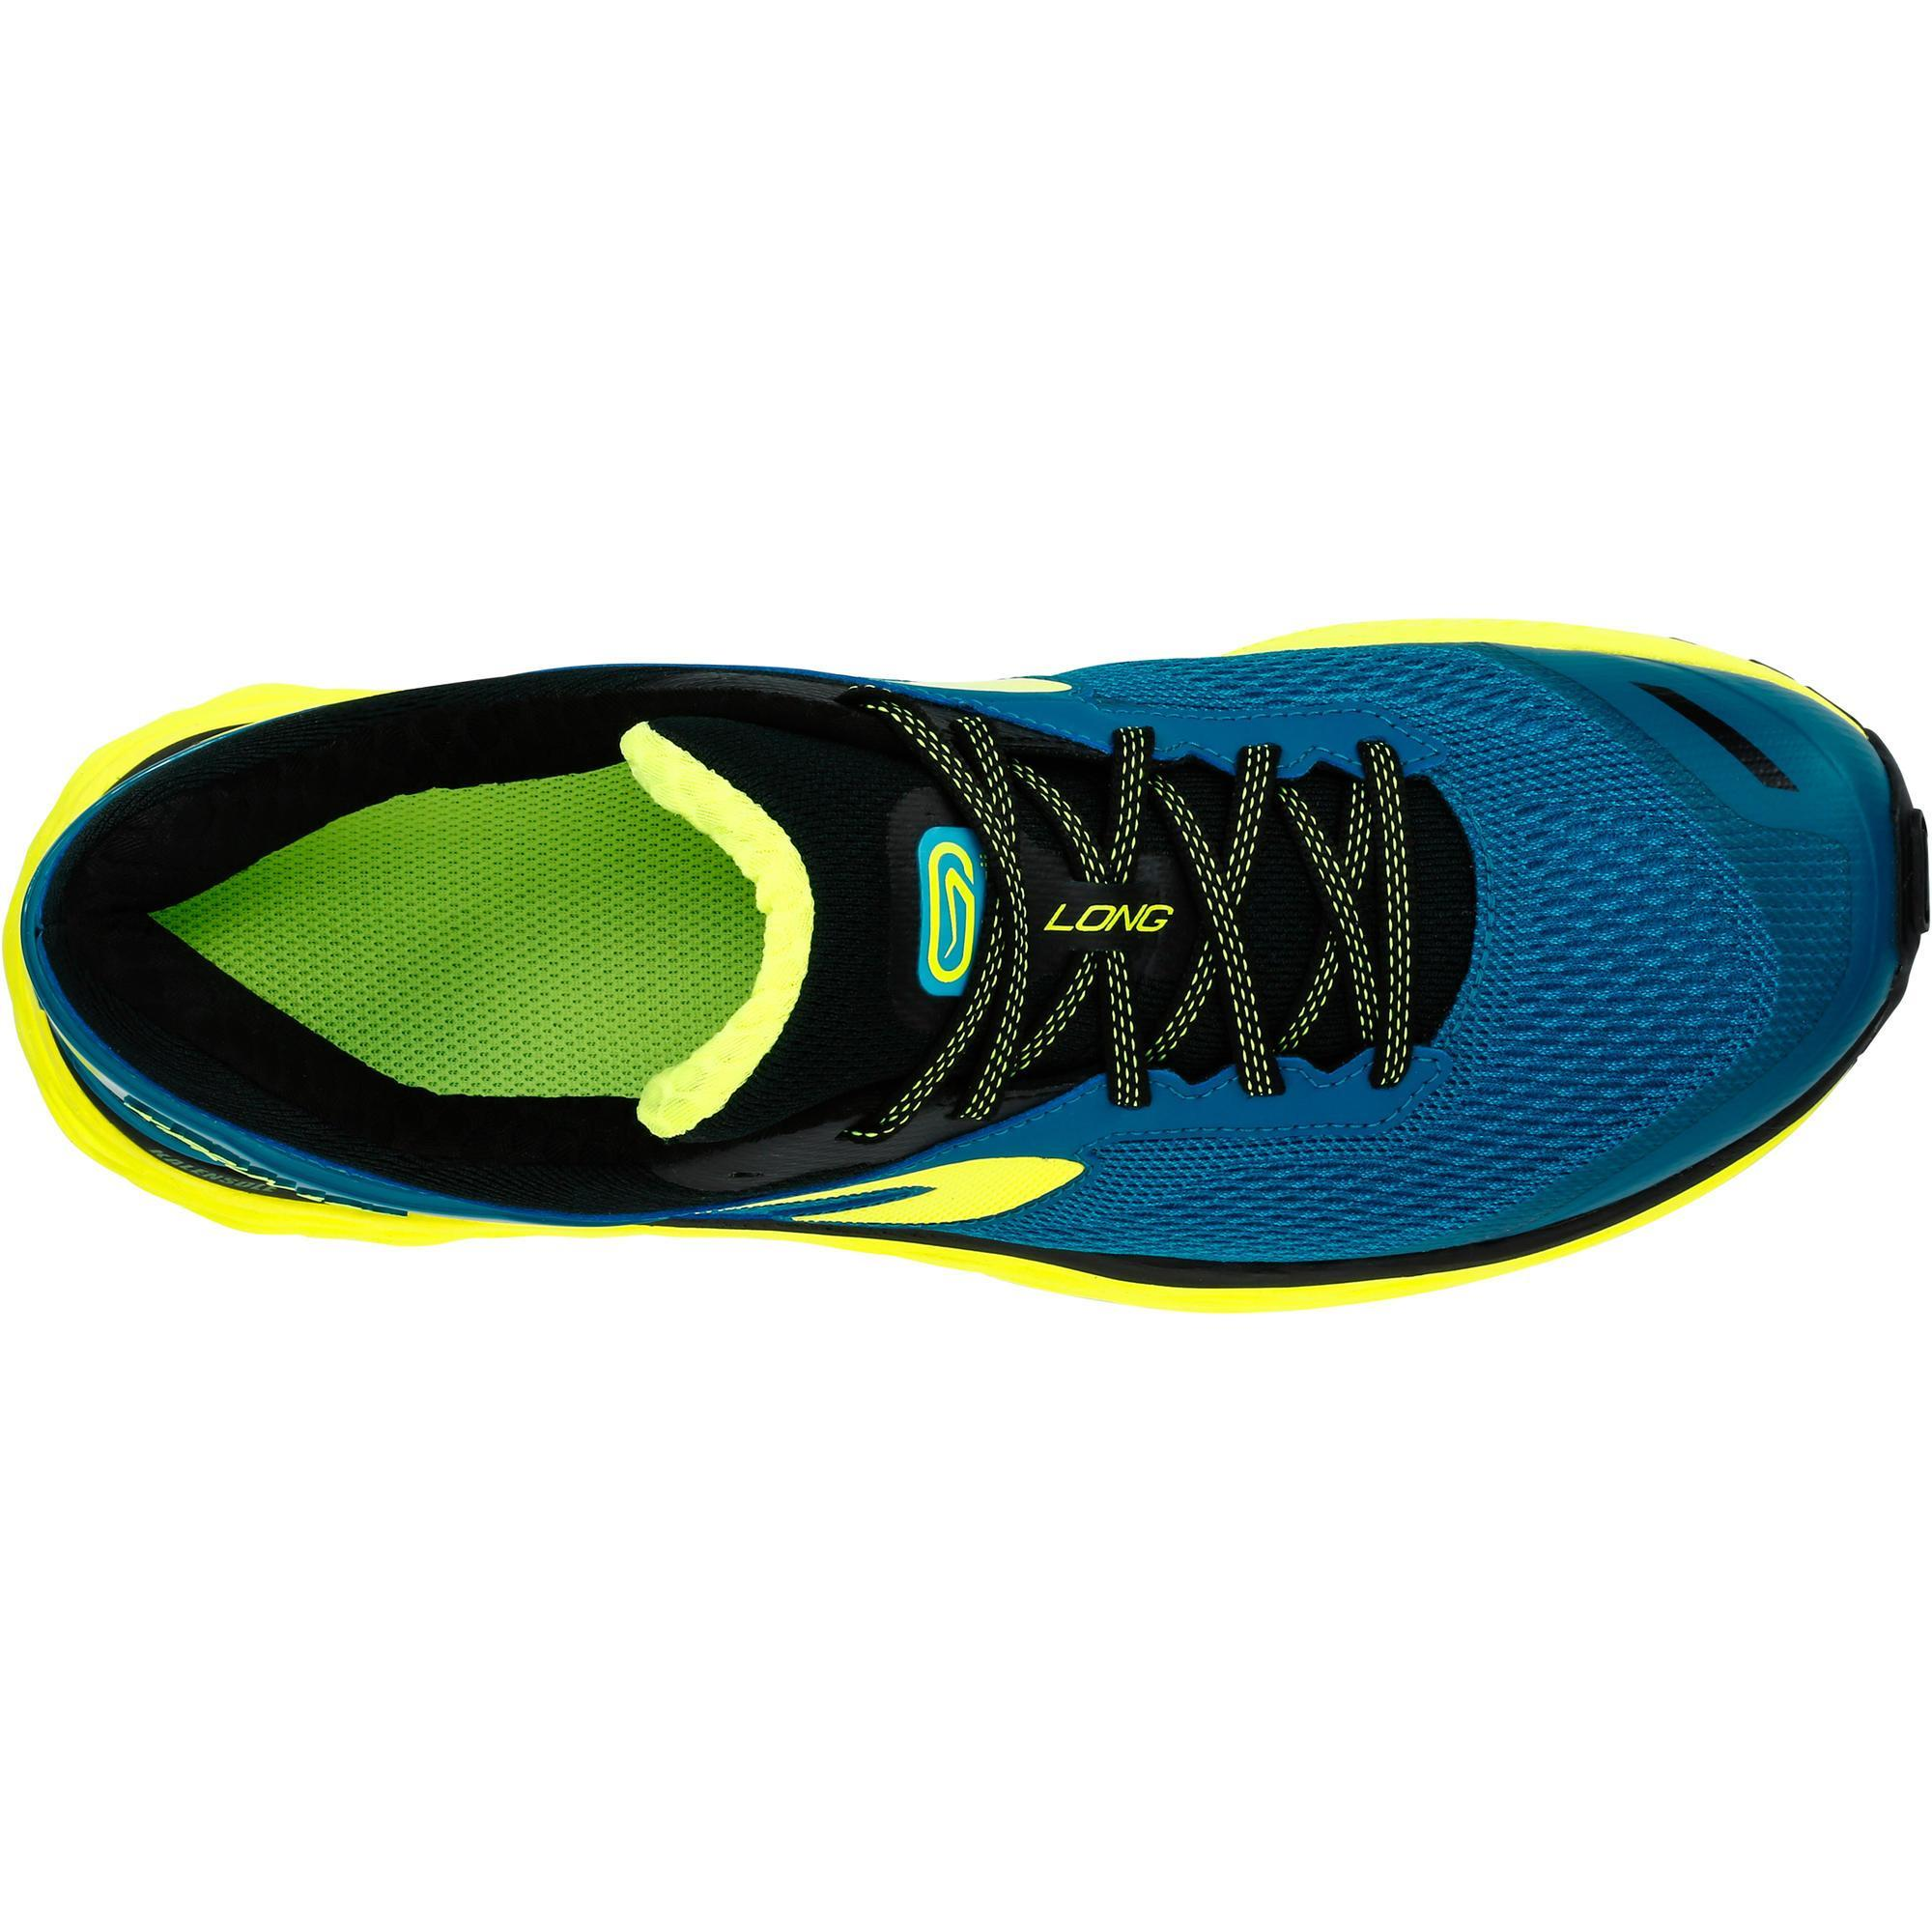 huge discount fb555 24834 Long Kiprun I8gqi Decathlon Running De Chaussures Homme Kalenji xrnqrXUC